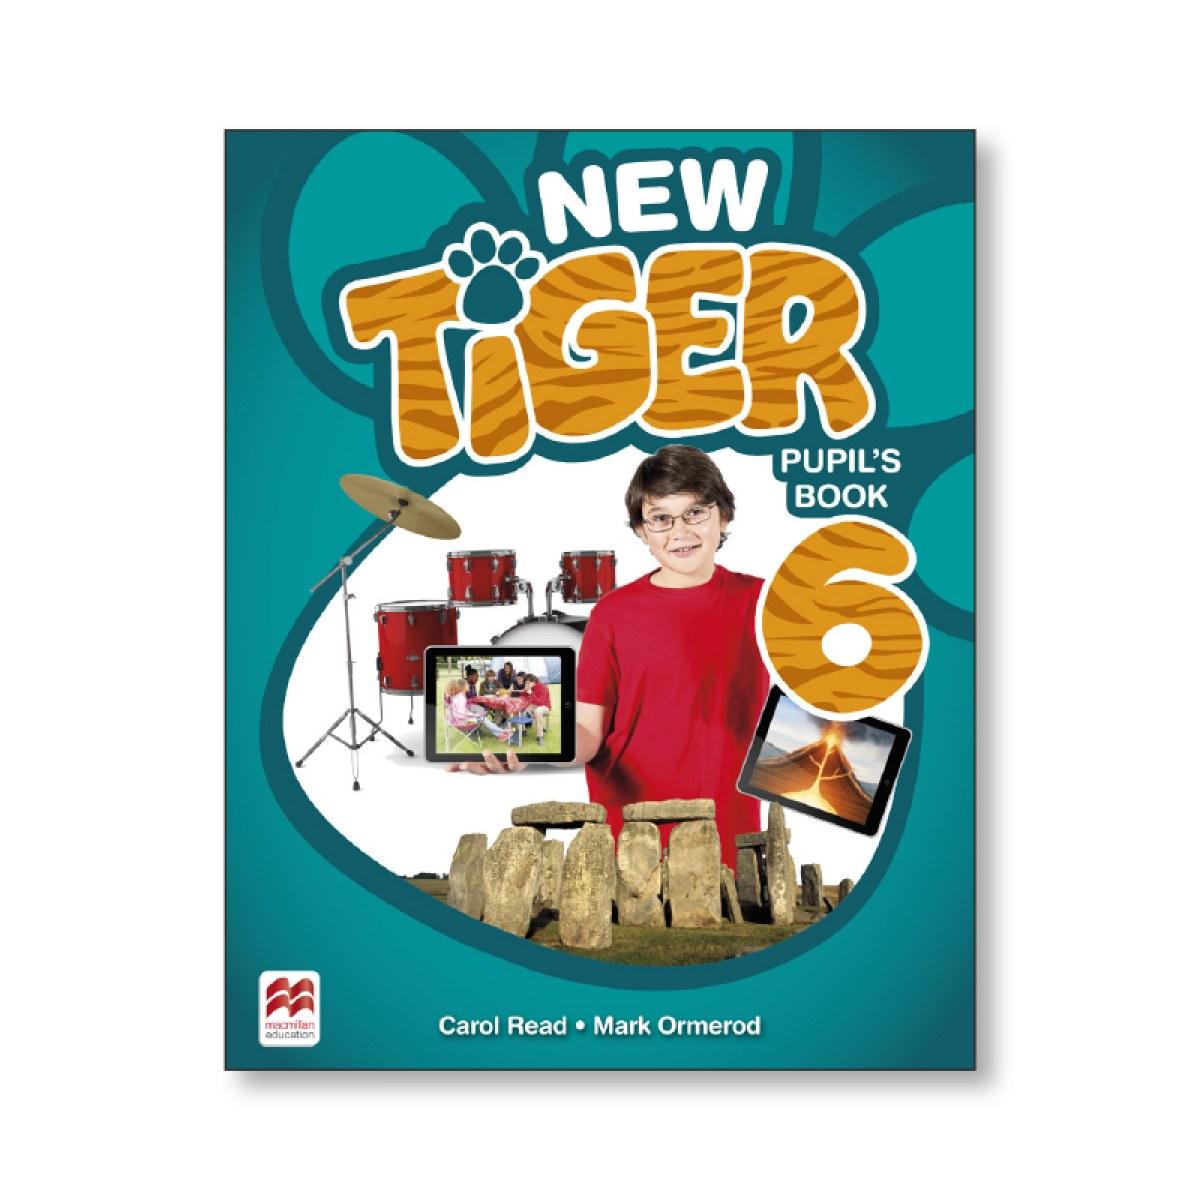 NEW TIGER 6 PUPIL S BOOK 9781380011169